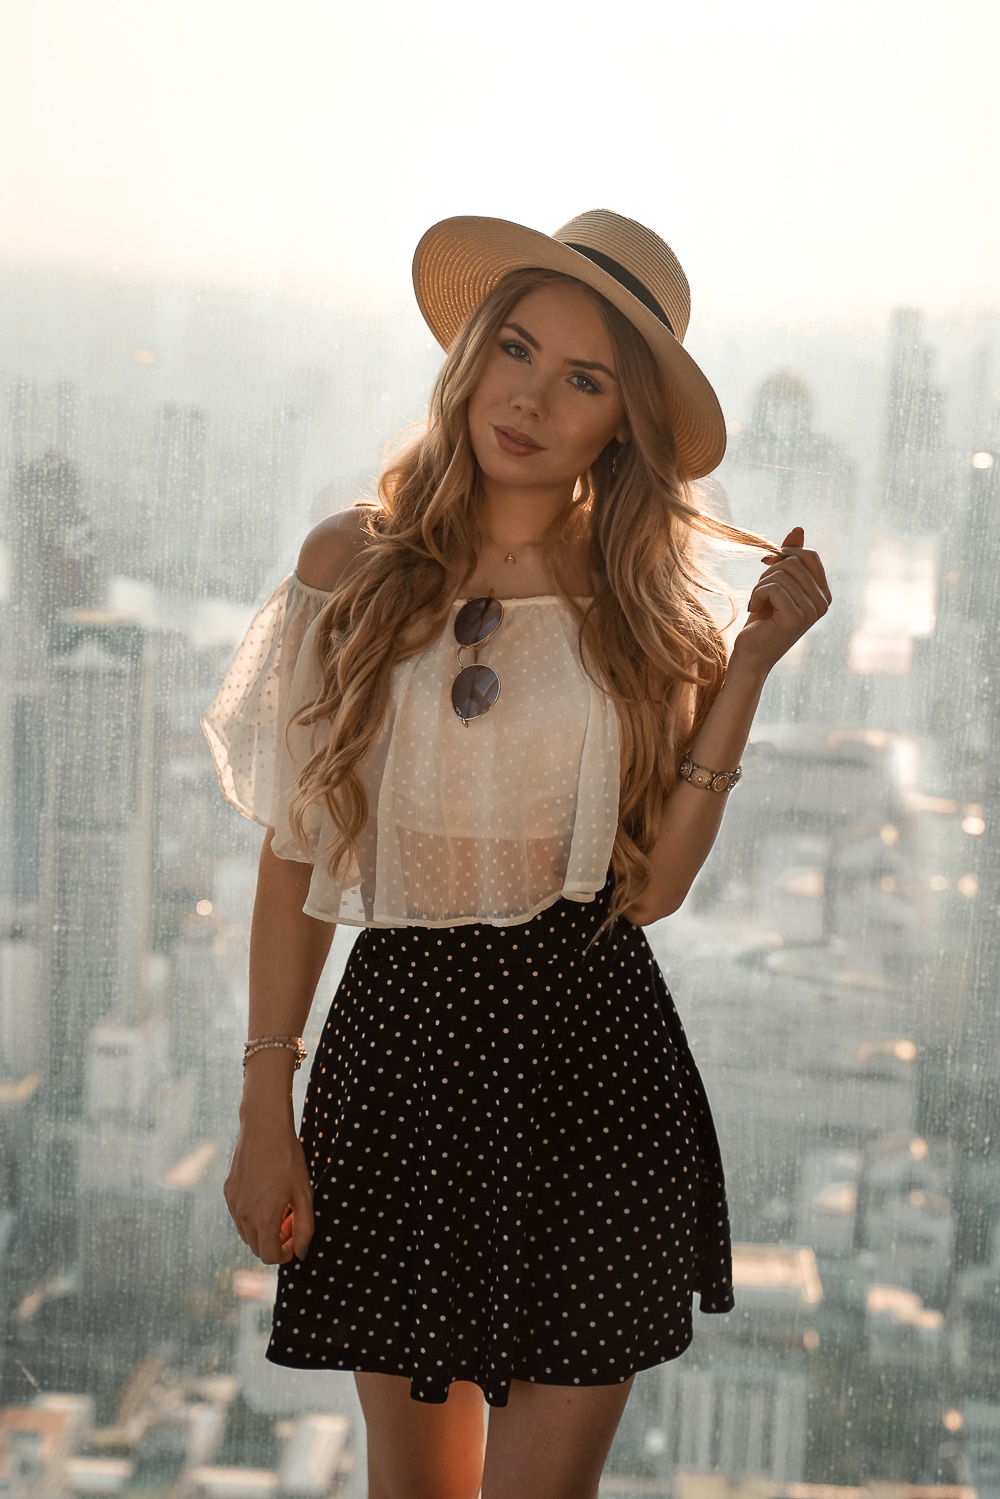 Mädchenhaftes Sommeroutfit-Crop Top-Rock